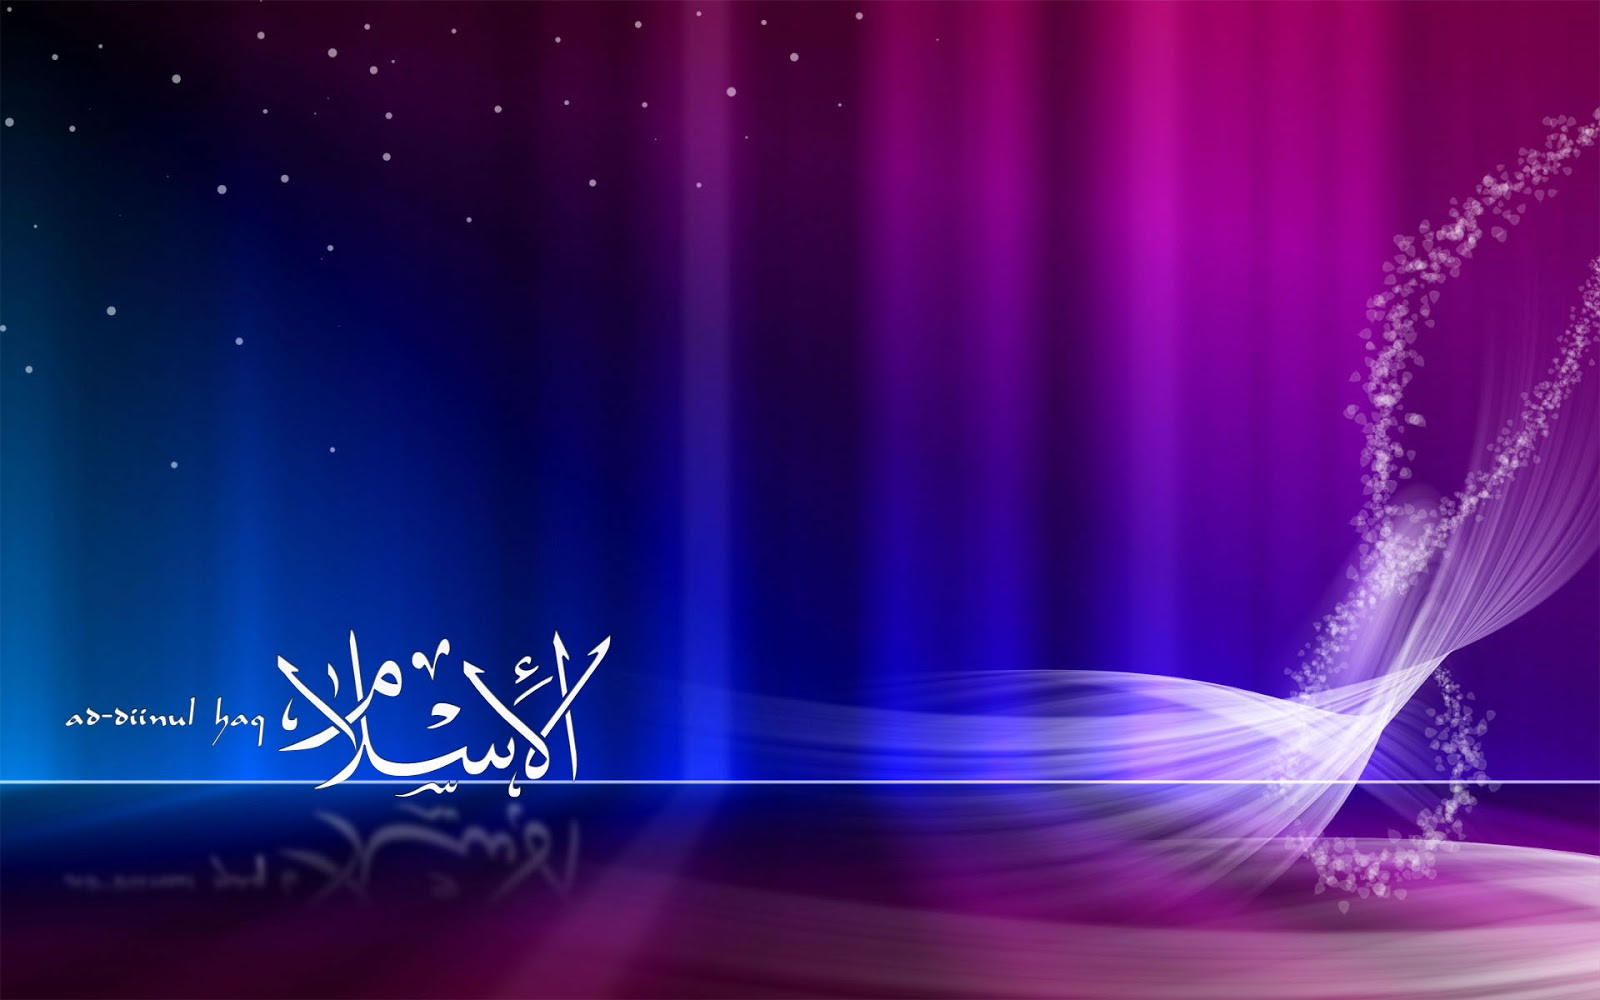 Gambar gambar wallpaper islam Muslim dan Indah   Gambat gambar paling 1600x1000